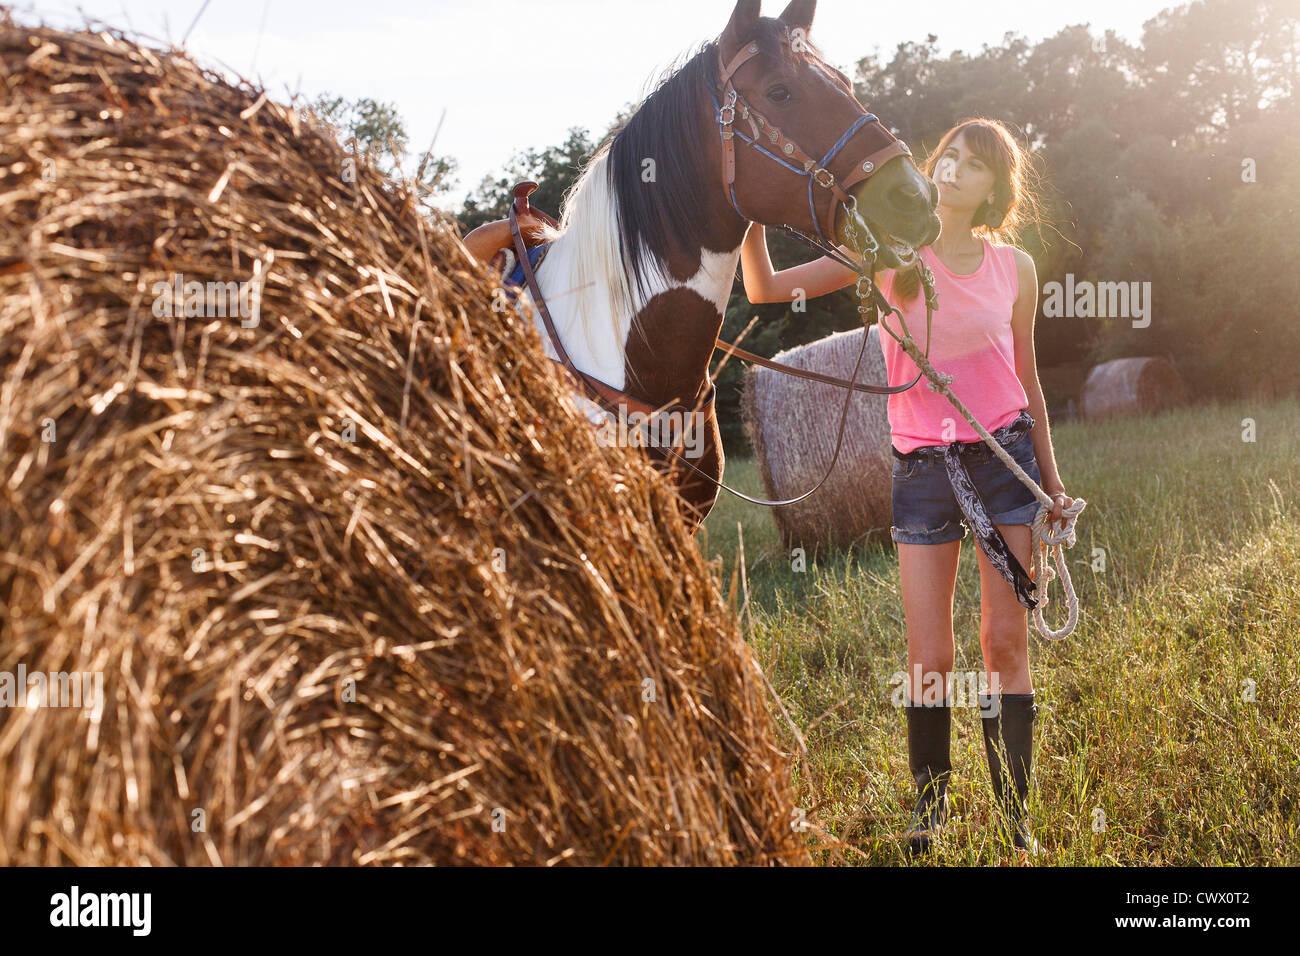 Woman walking horse in meadow - Stock Image